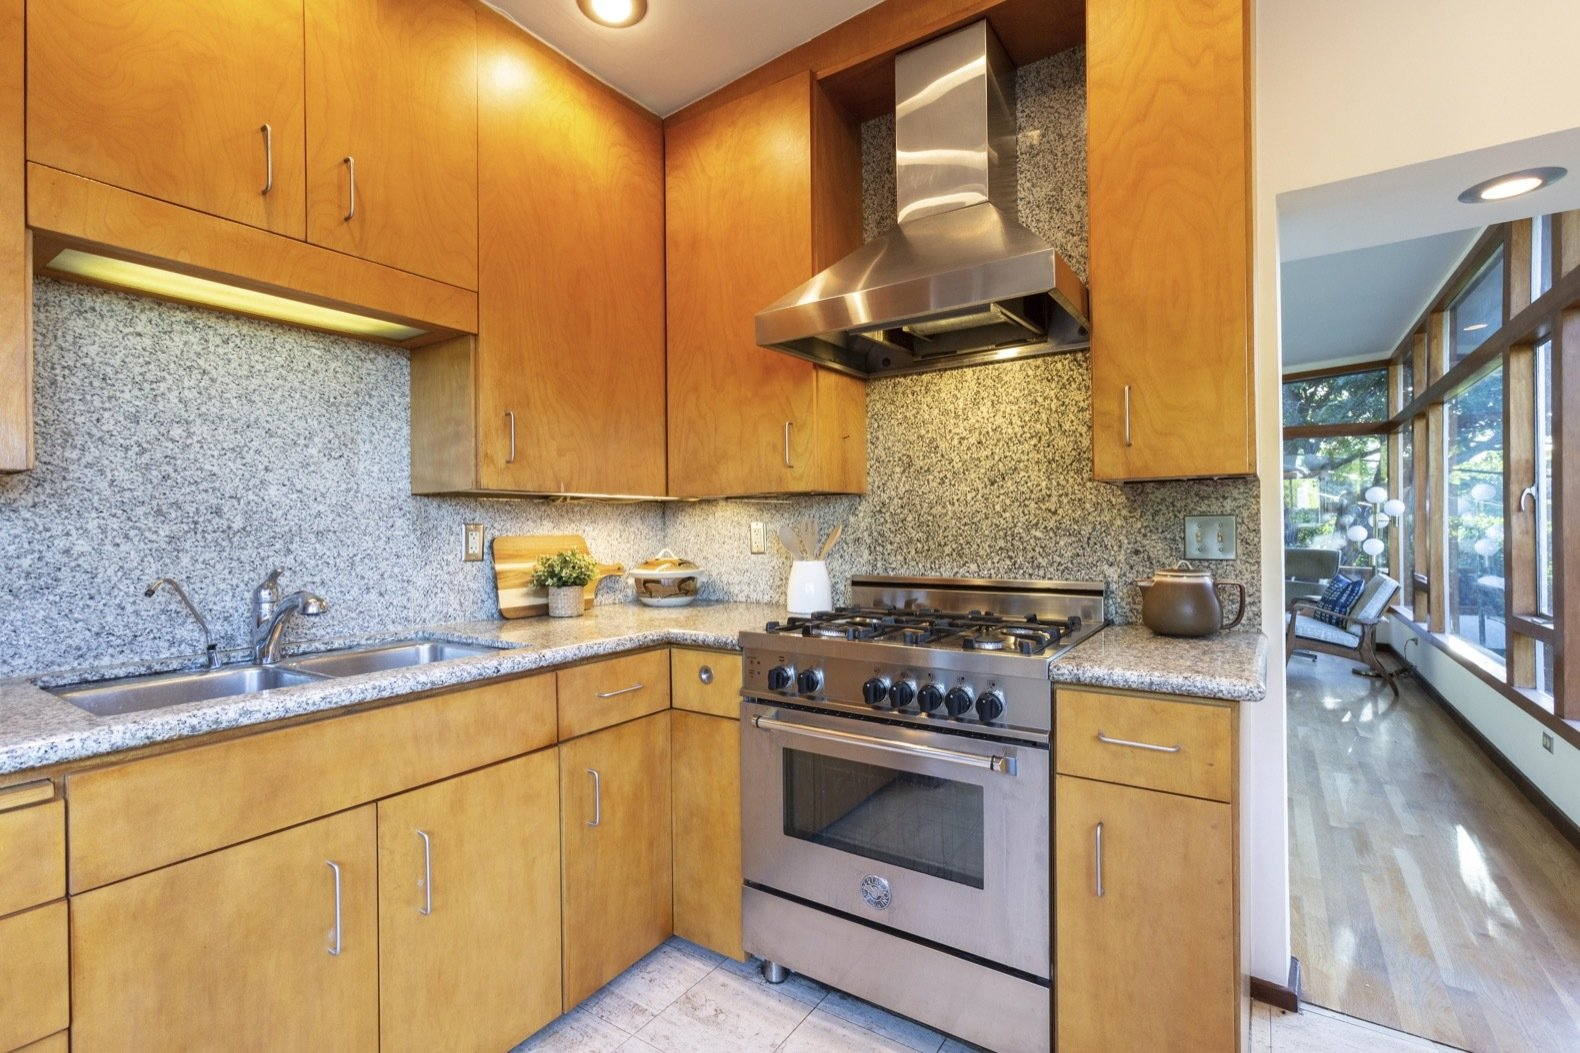 John Kewell midcentury home kitchen